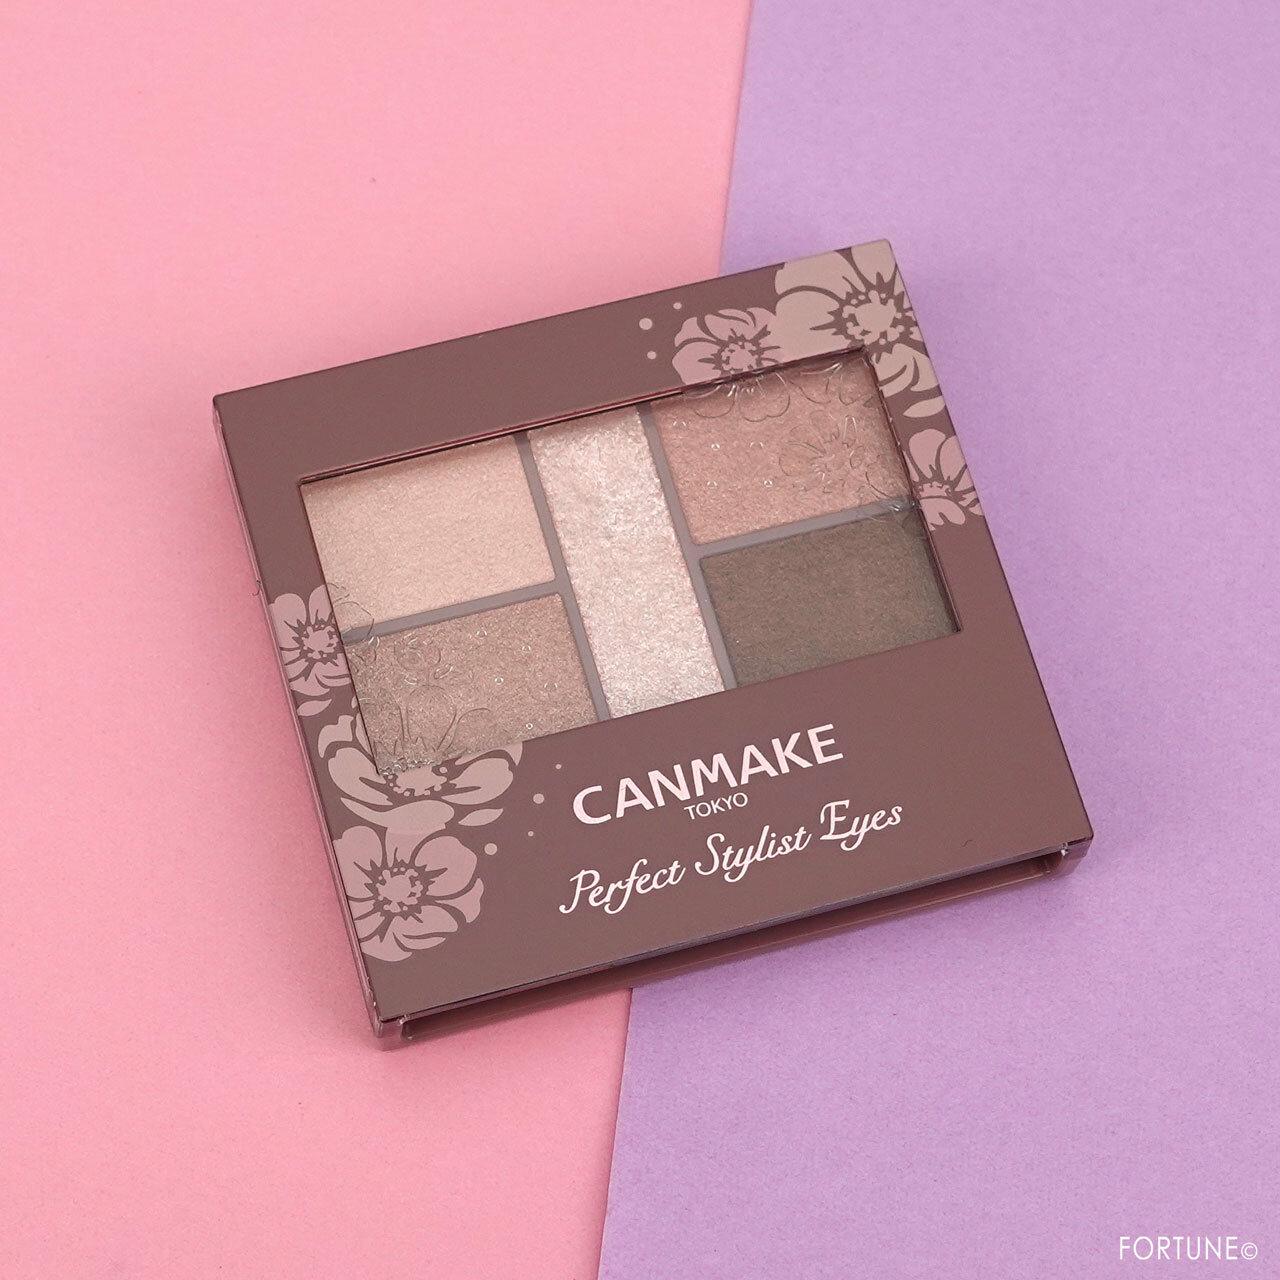 CANMAKE/キャンメイク パーフェクトスタイリストアイズ